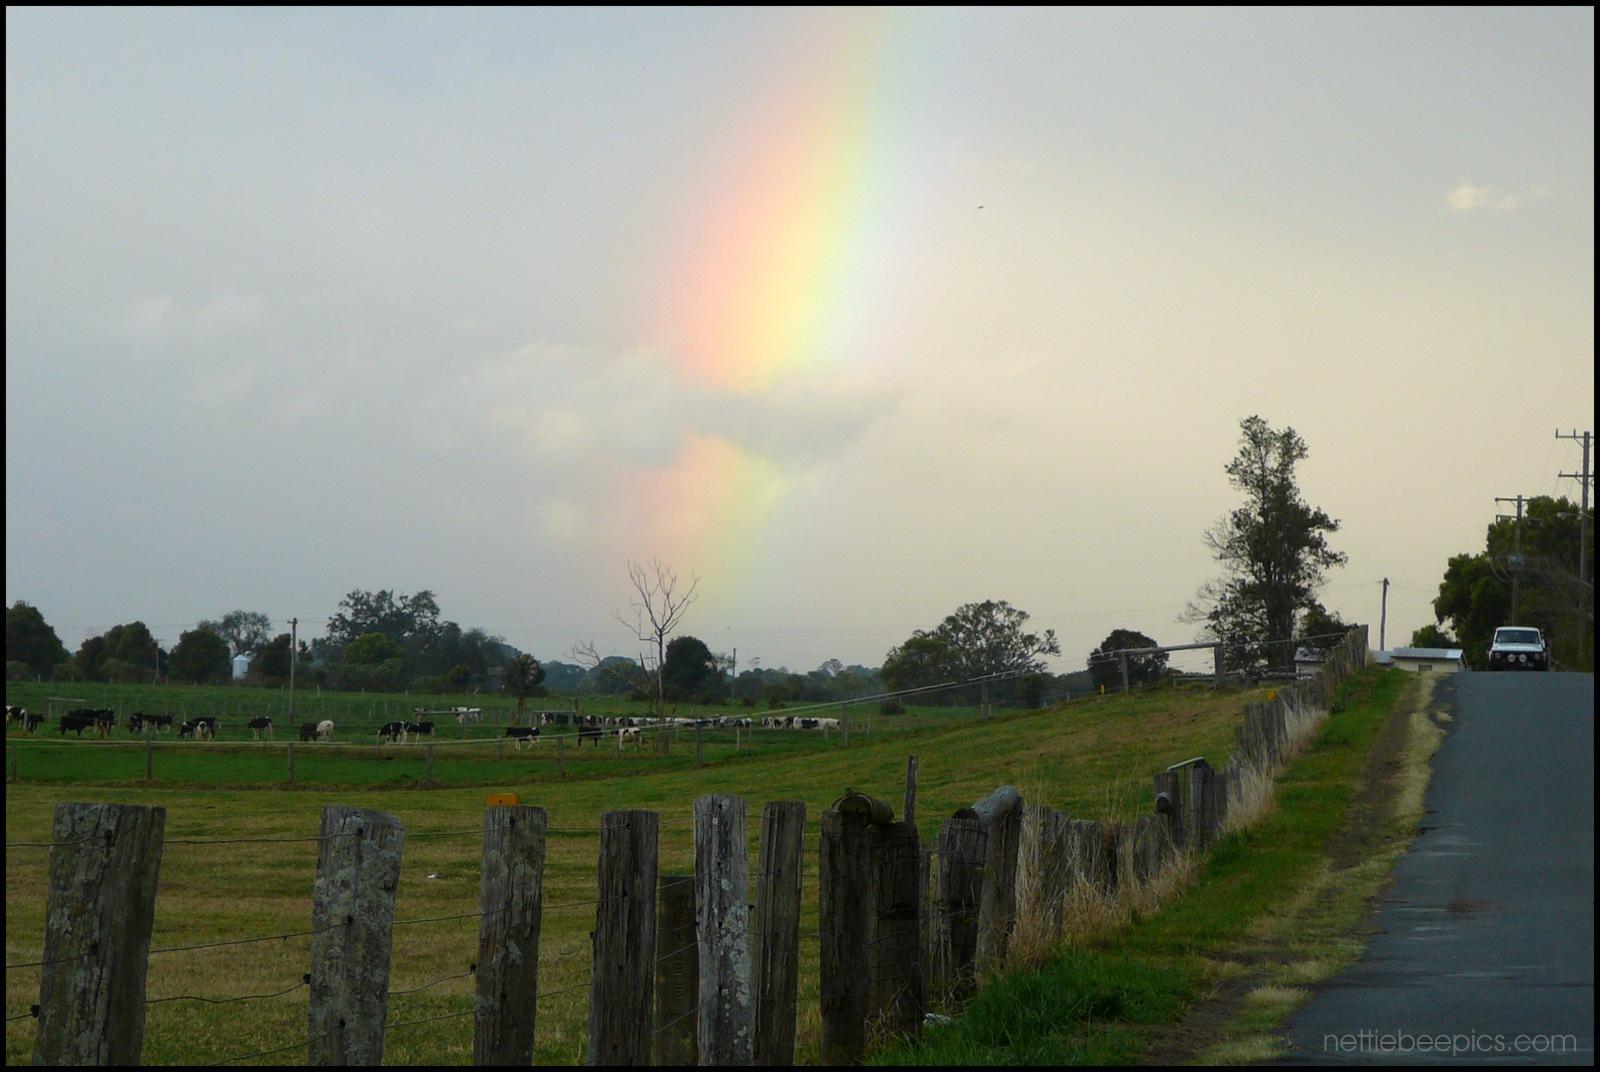 Rainbow on the Farm by Nettie Bee